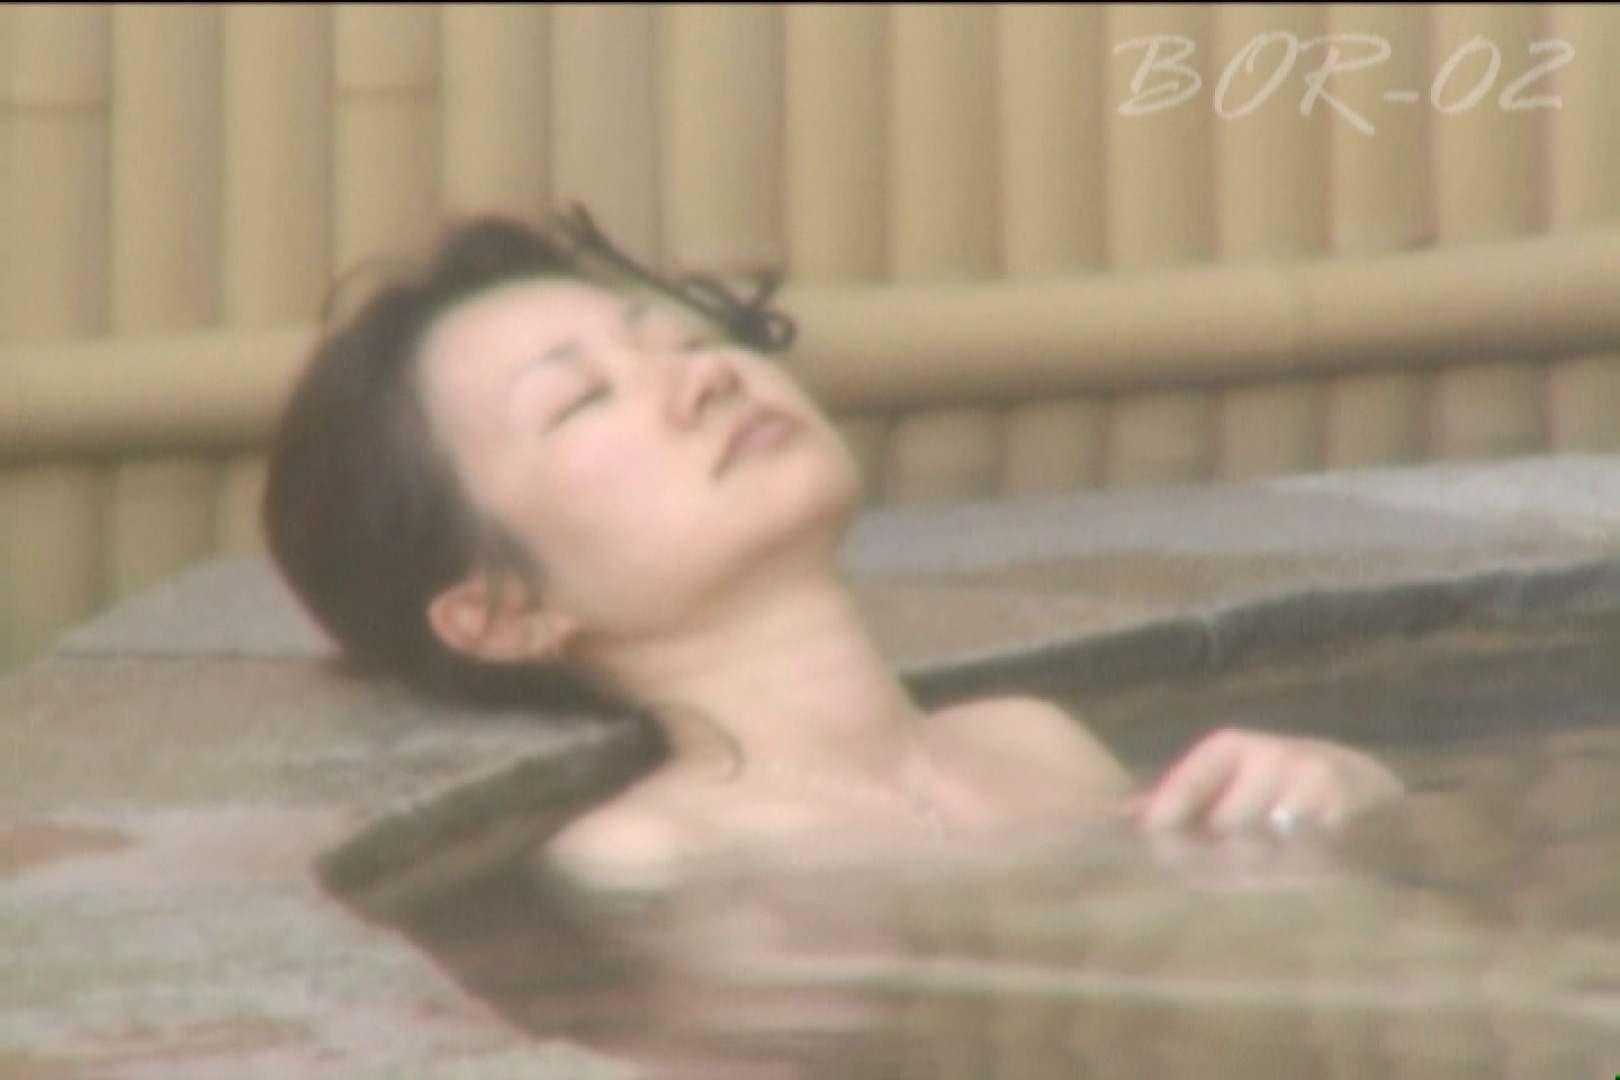 Aquaな露天風呂Vol.477 0 | 0  28連発 17